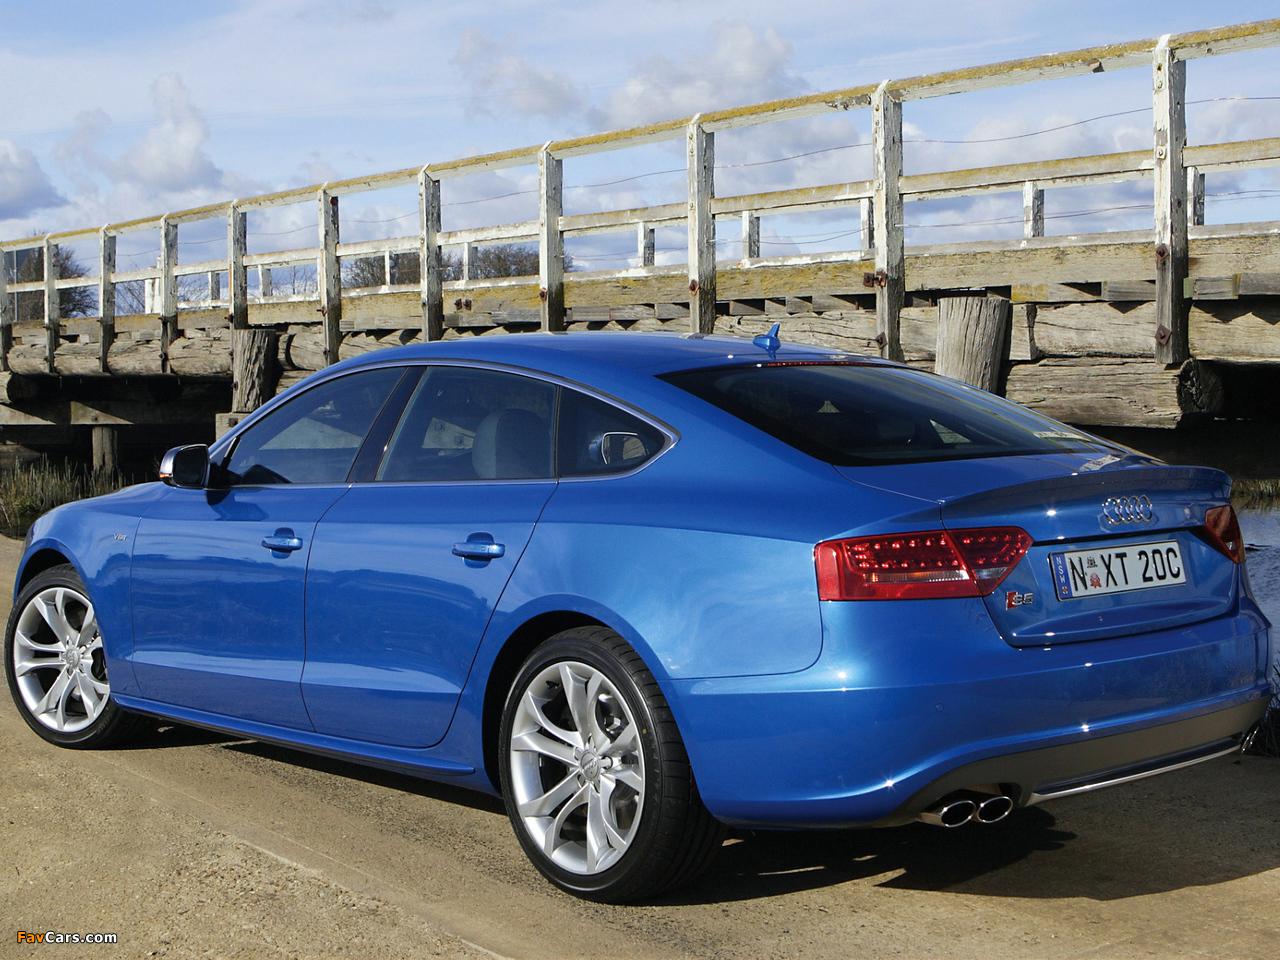 Photos Of Audi S5 Sportback Au Spec 2010 11 1280x960